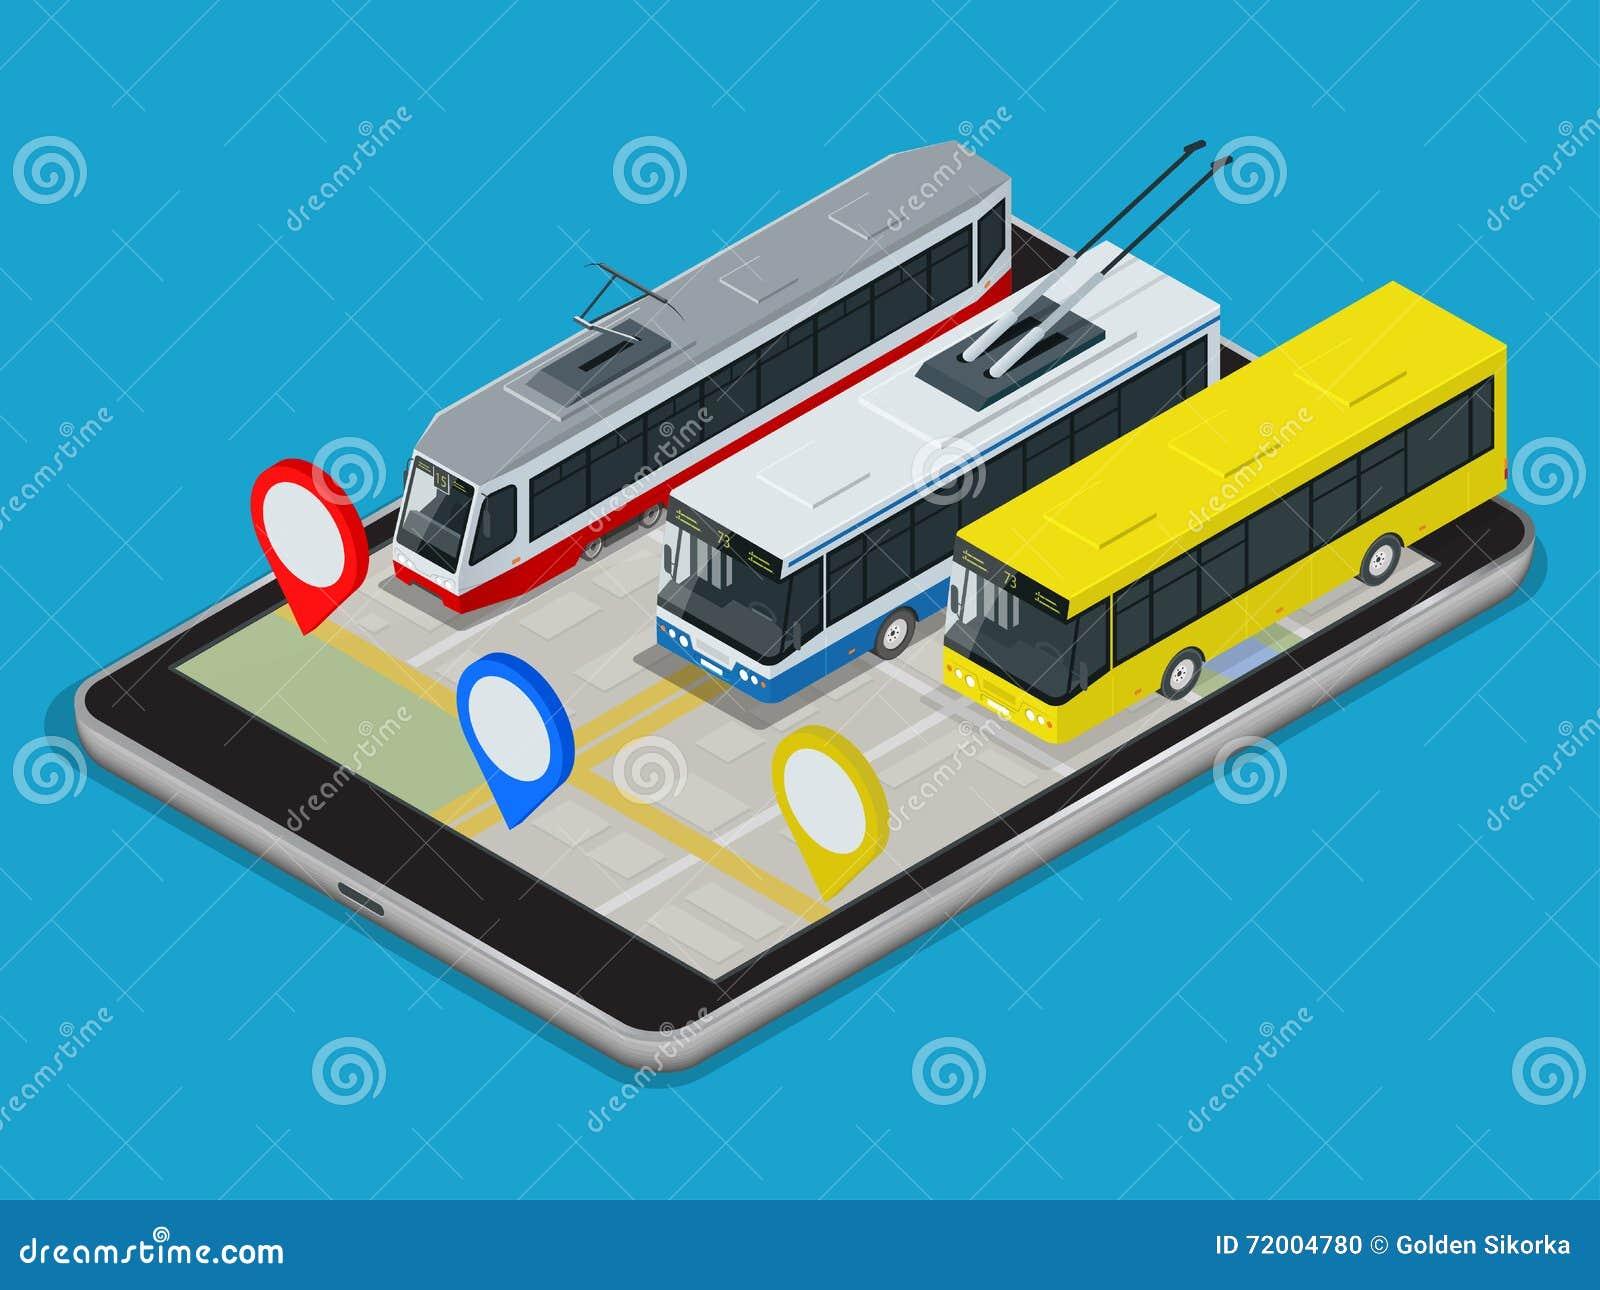 public transport trolleybus, bus, tram . online schedule app for